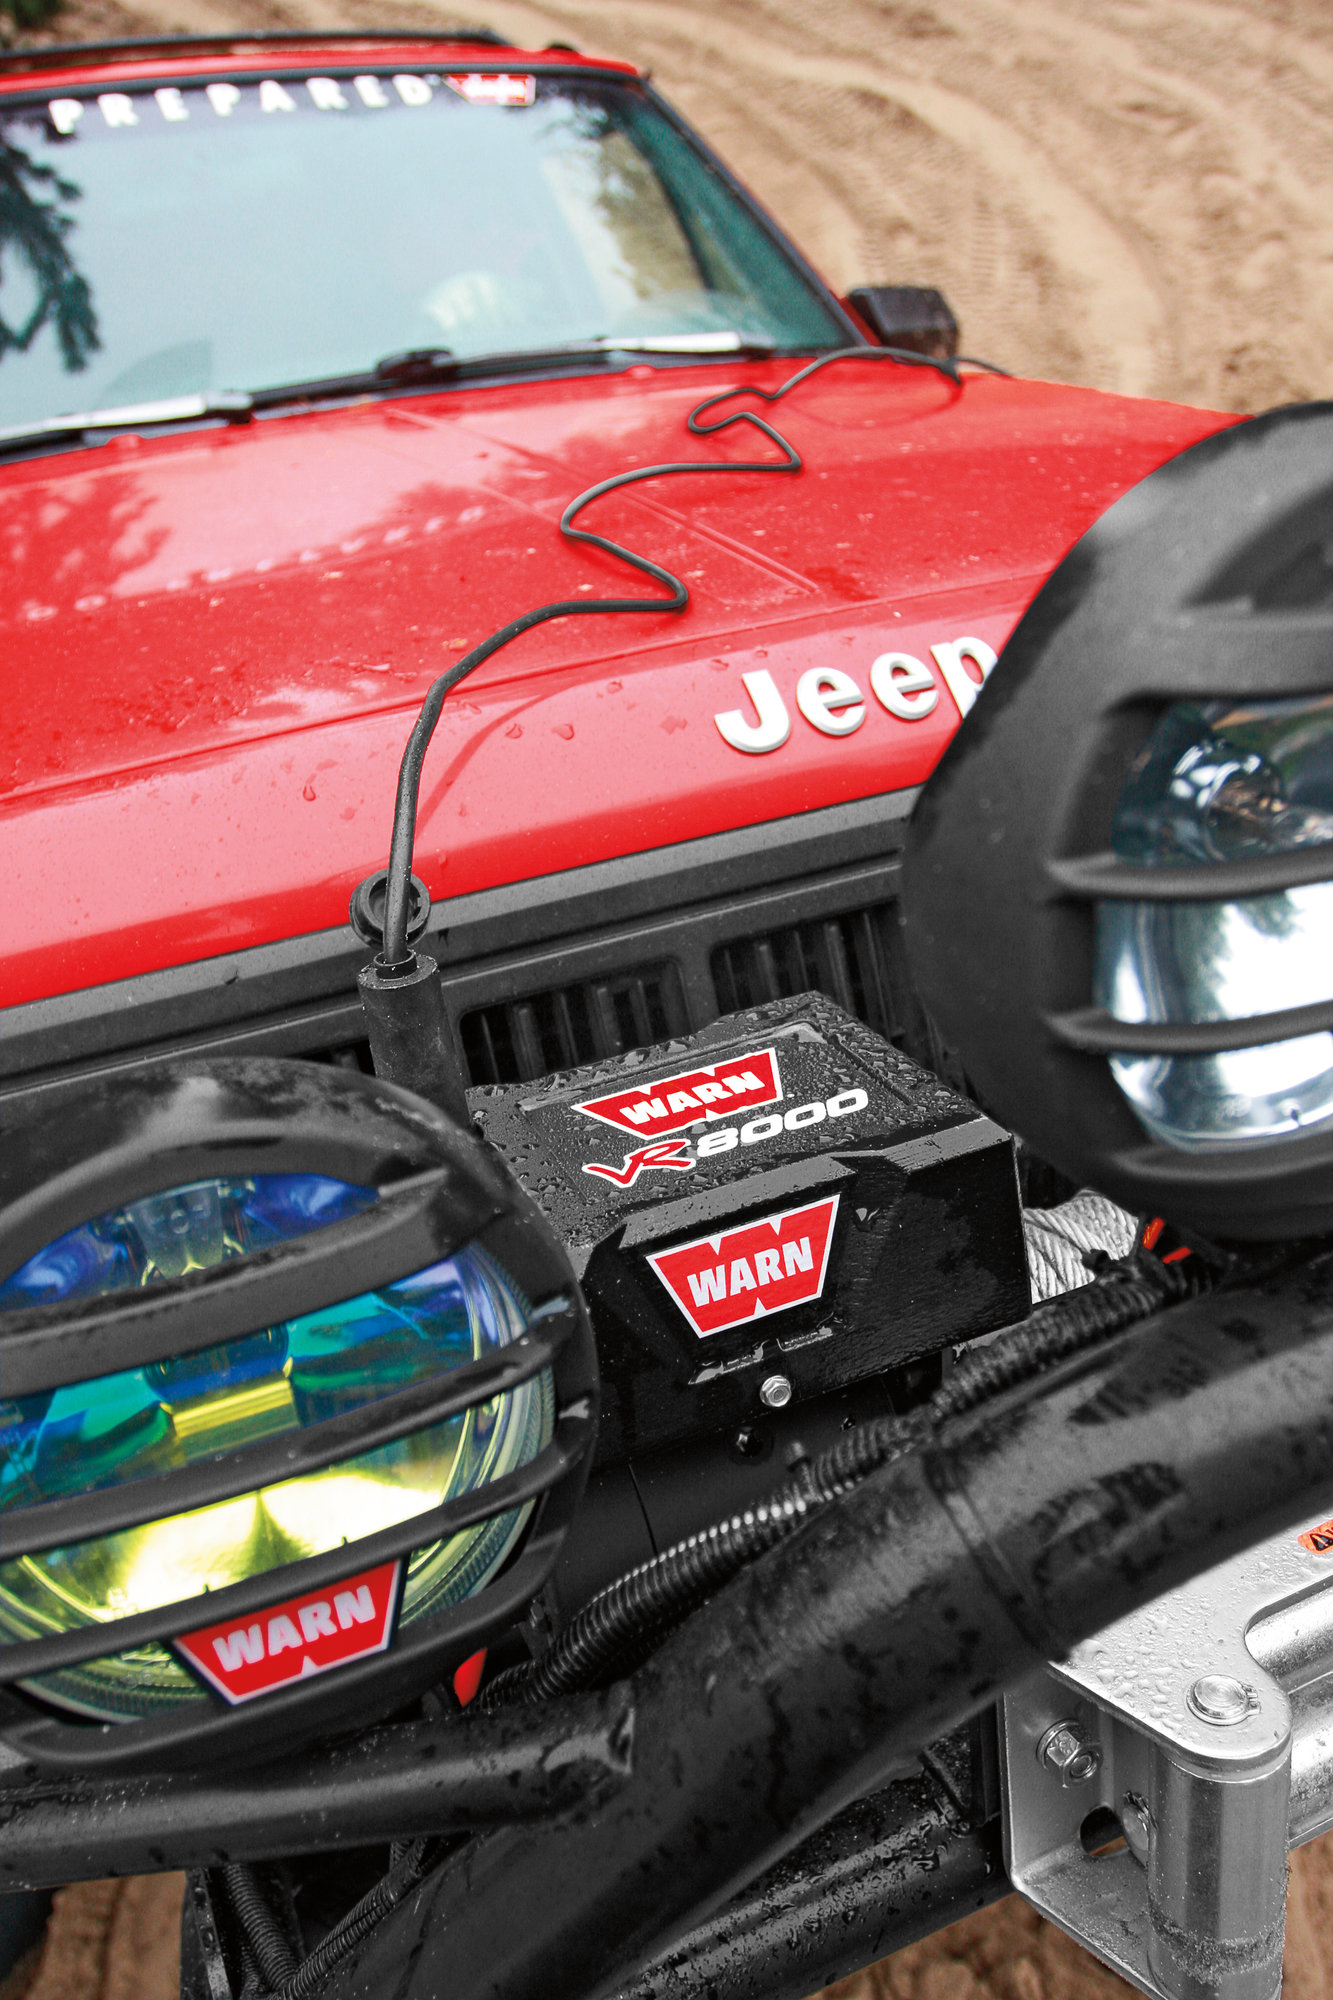 Warn A2500 Wiring Diagram - Auto Electrical Wiring Diagram on